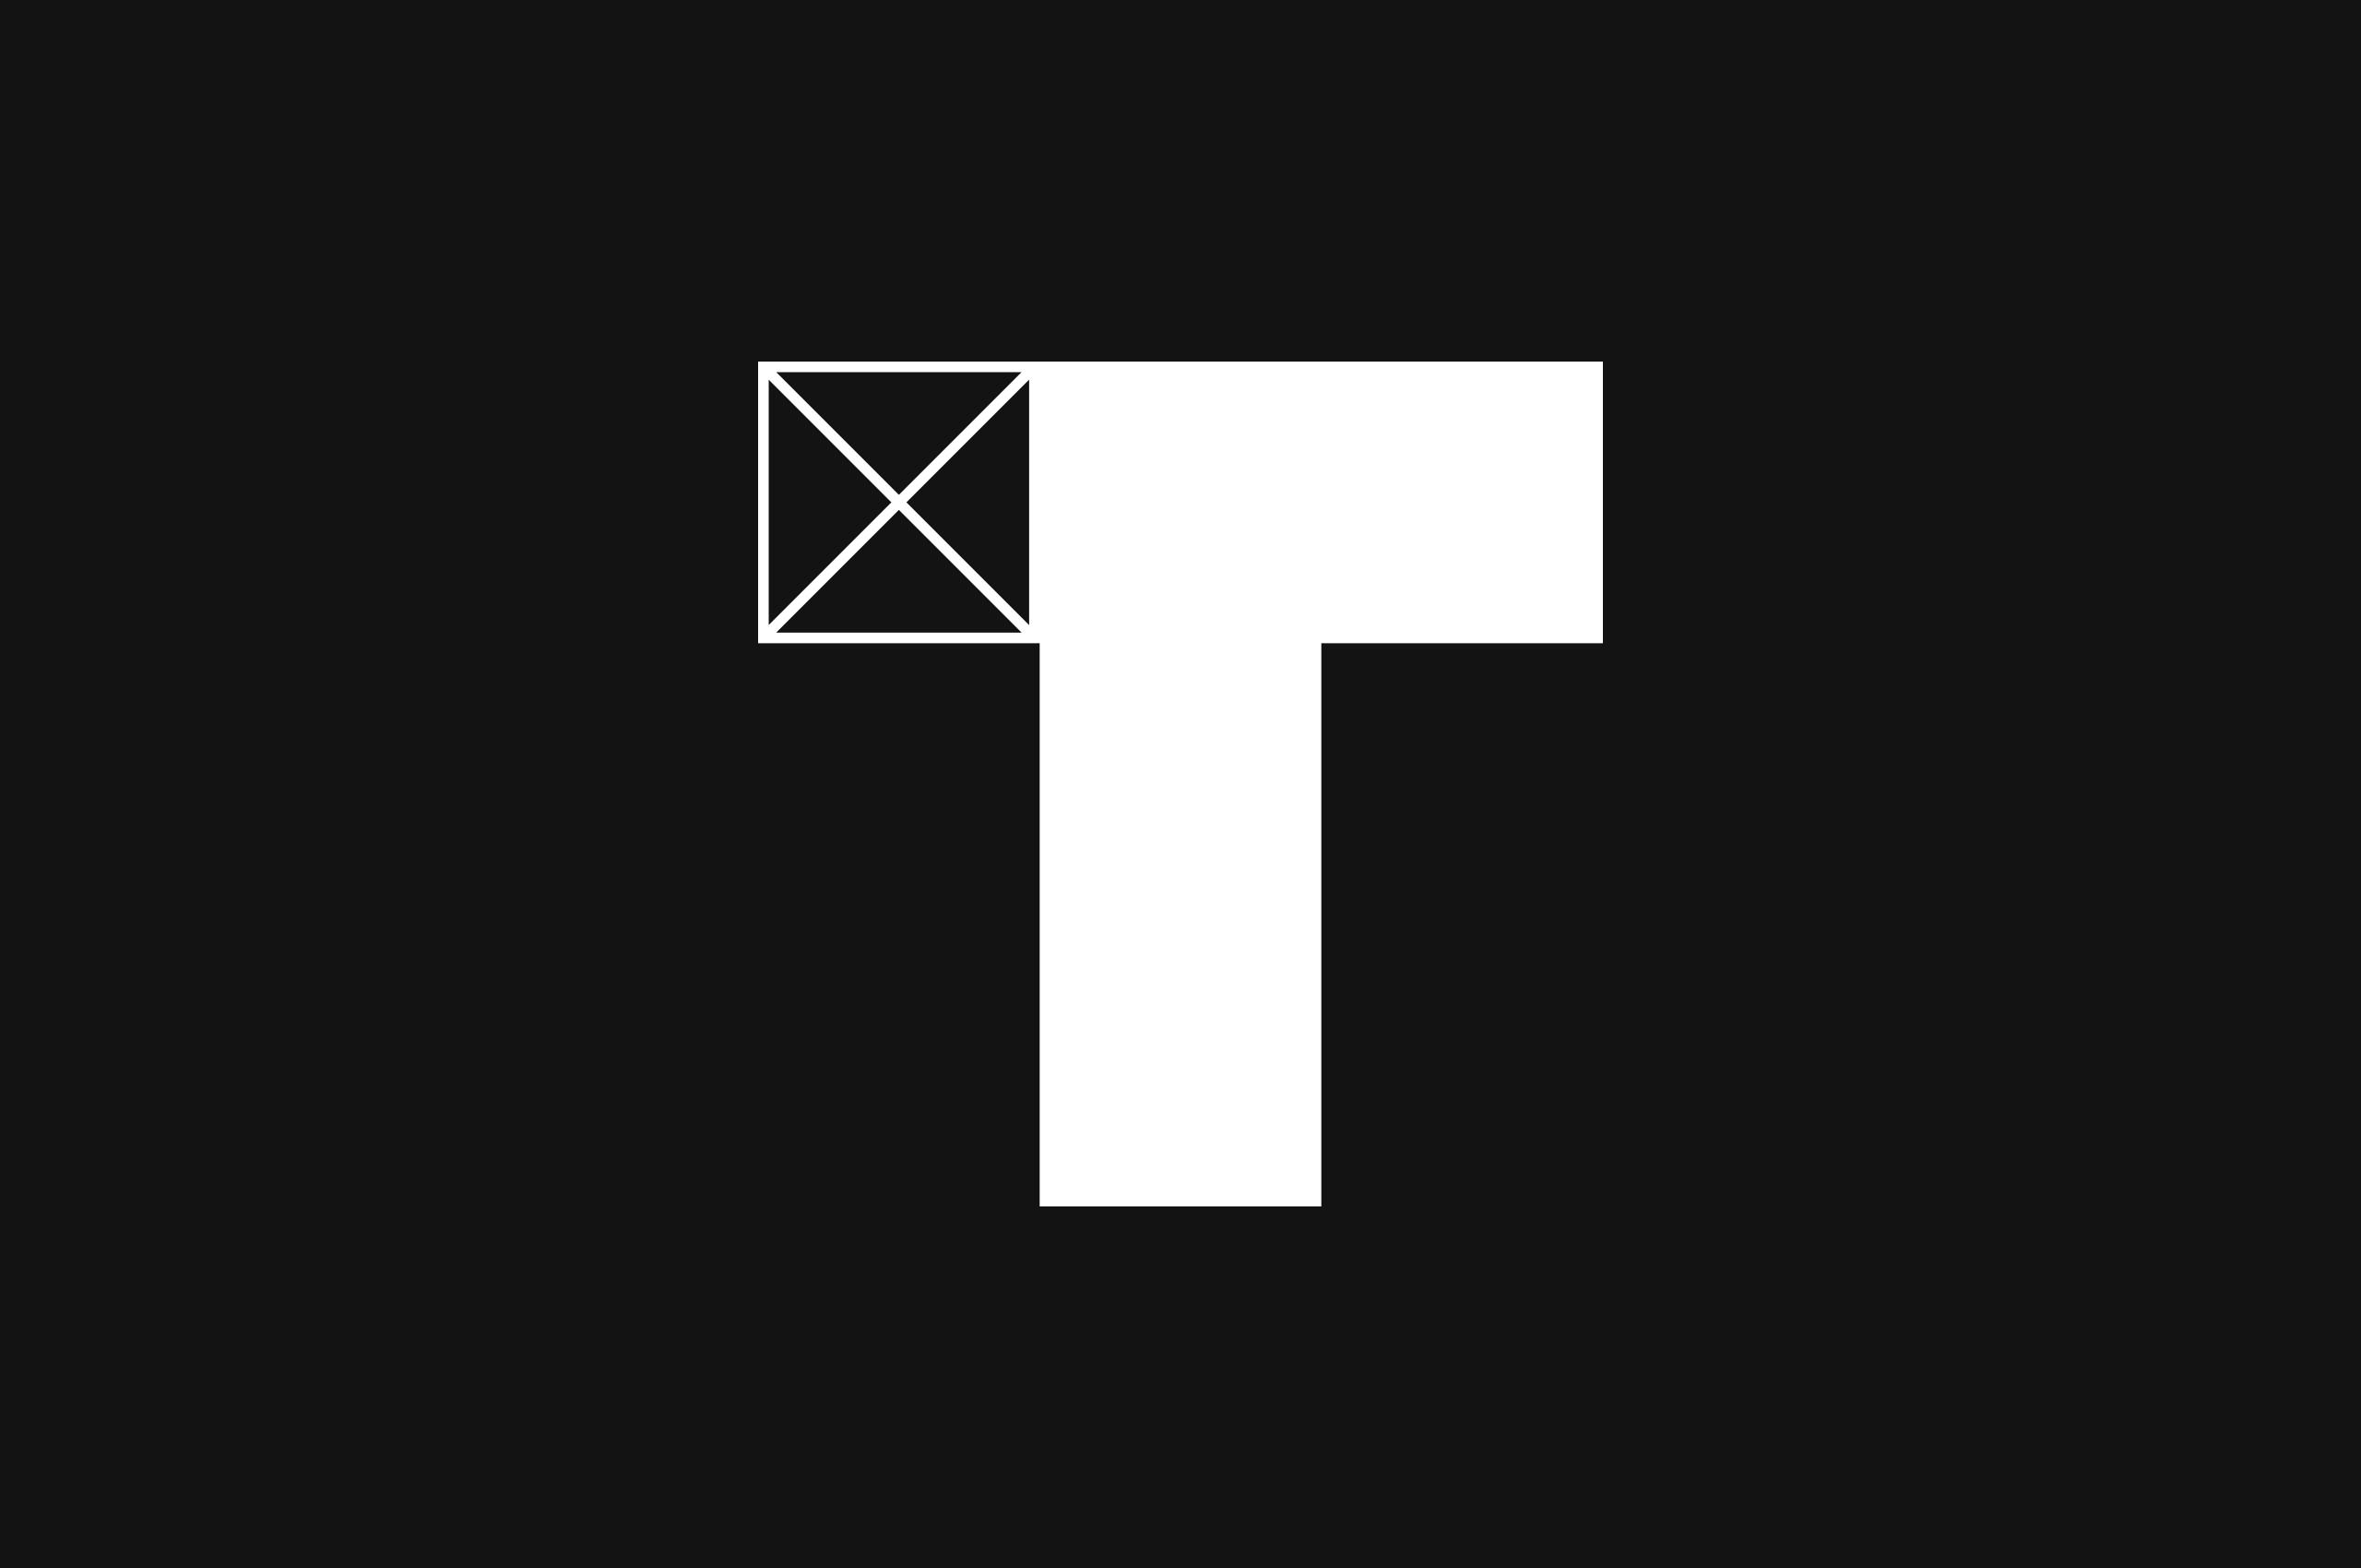 teform-main-new-5